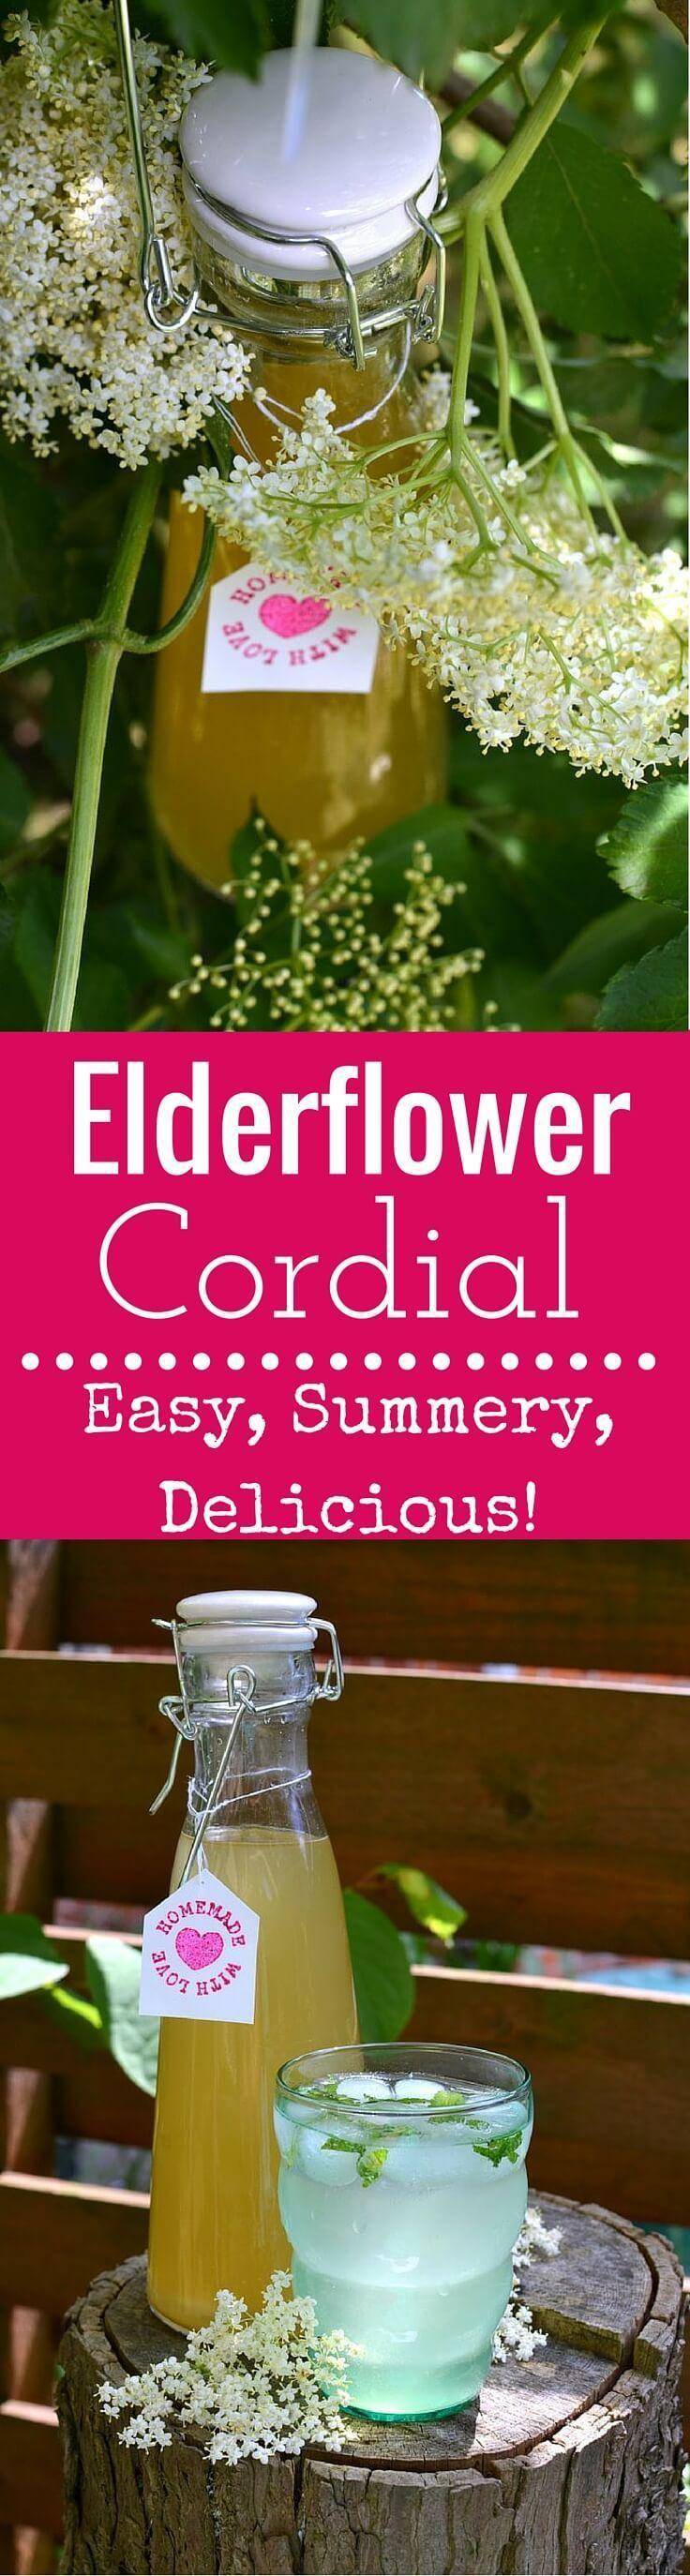 Elderflower Cordial: Forage for elderflowers and make this easy Elderflower Cordial at home. Enjoy the cordial in drinks and treats all summer long!